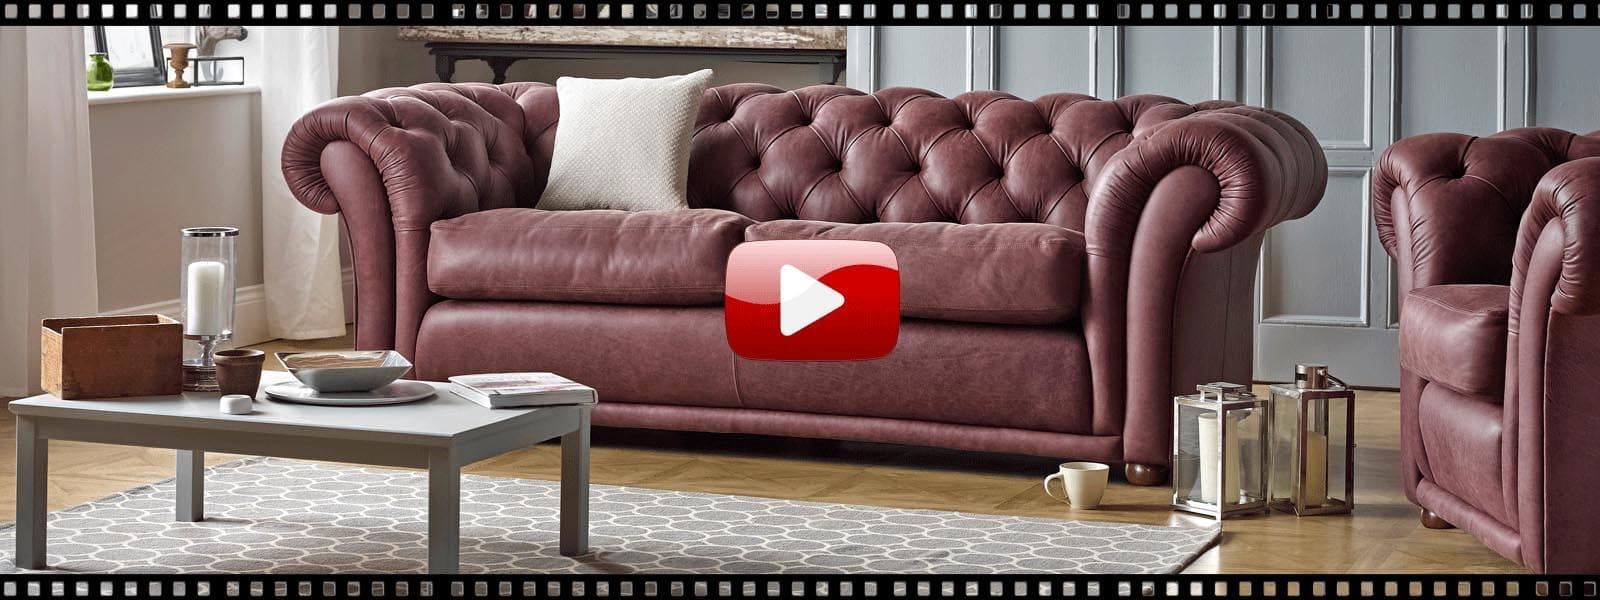 100 tudor sofa 22 best tudor furniture images on pinterest